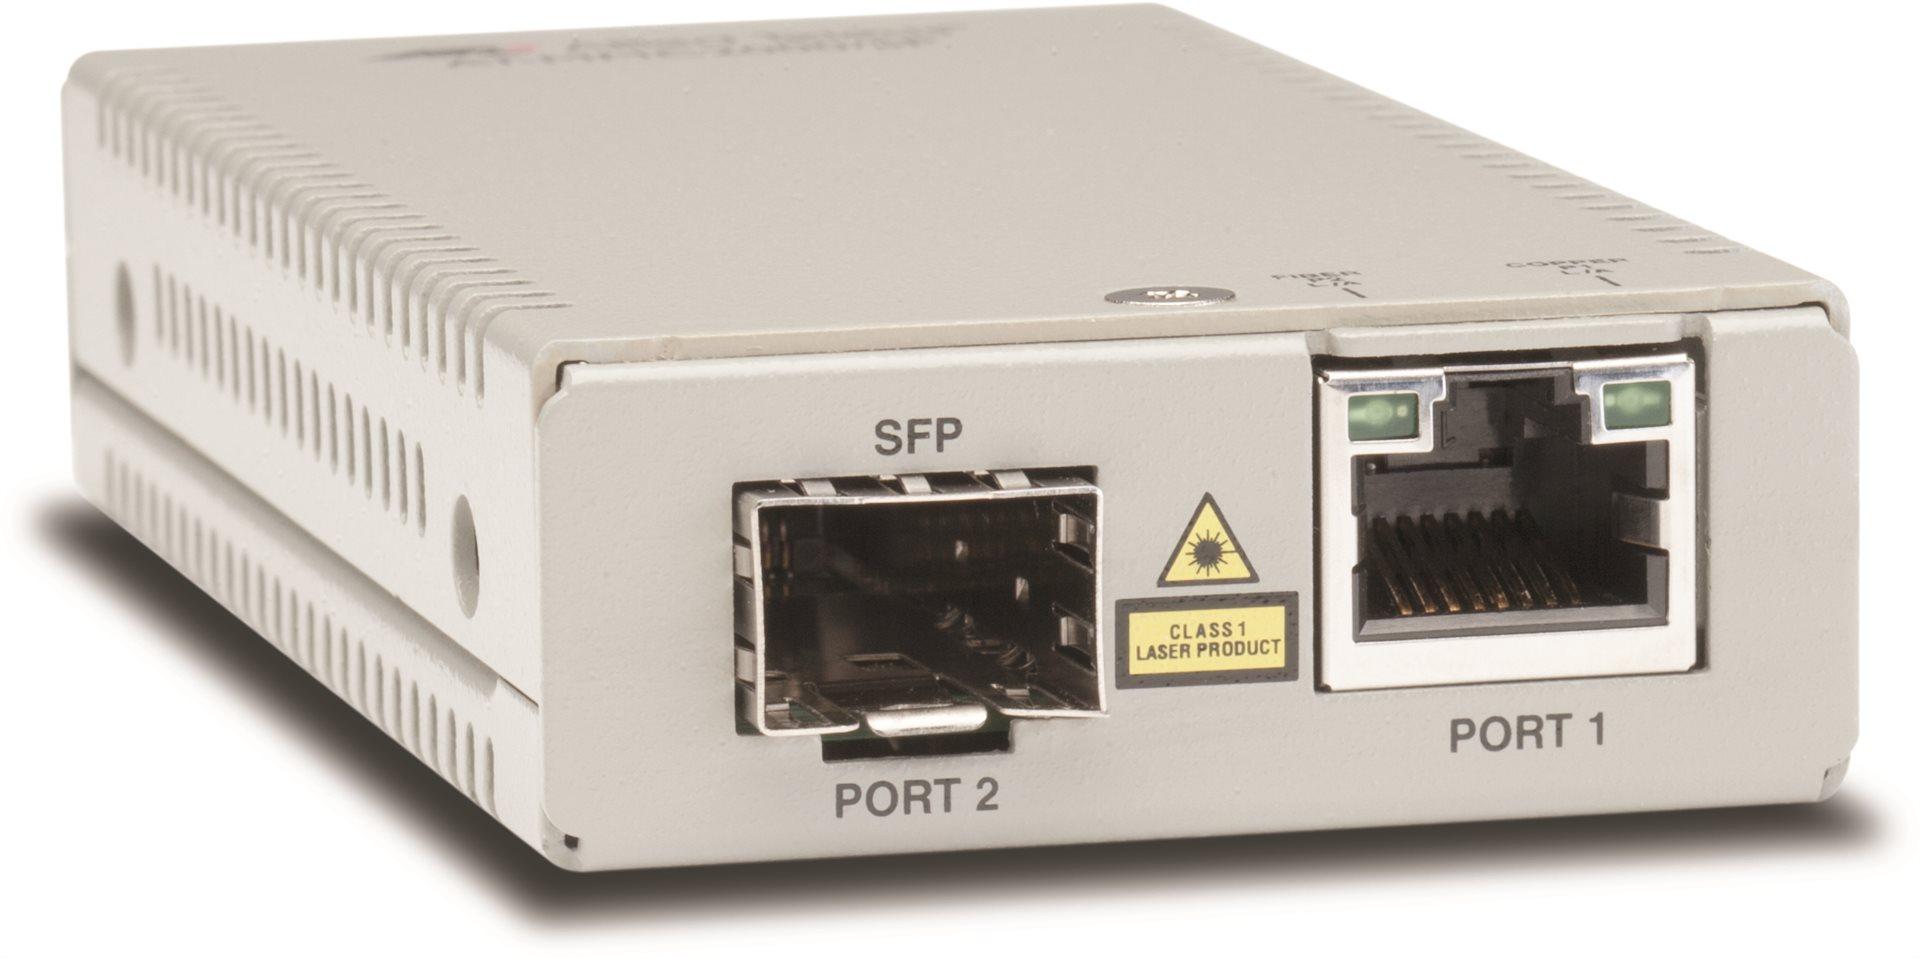 Allied Telesis AT-MMC2000/SP